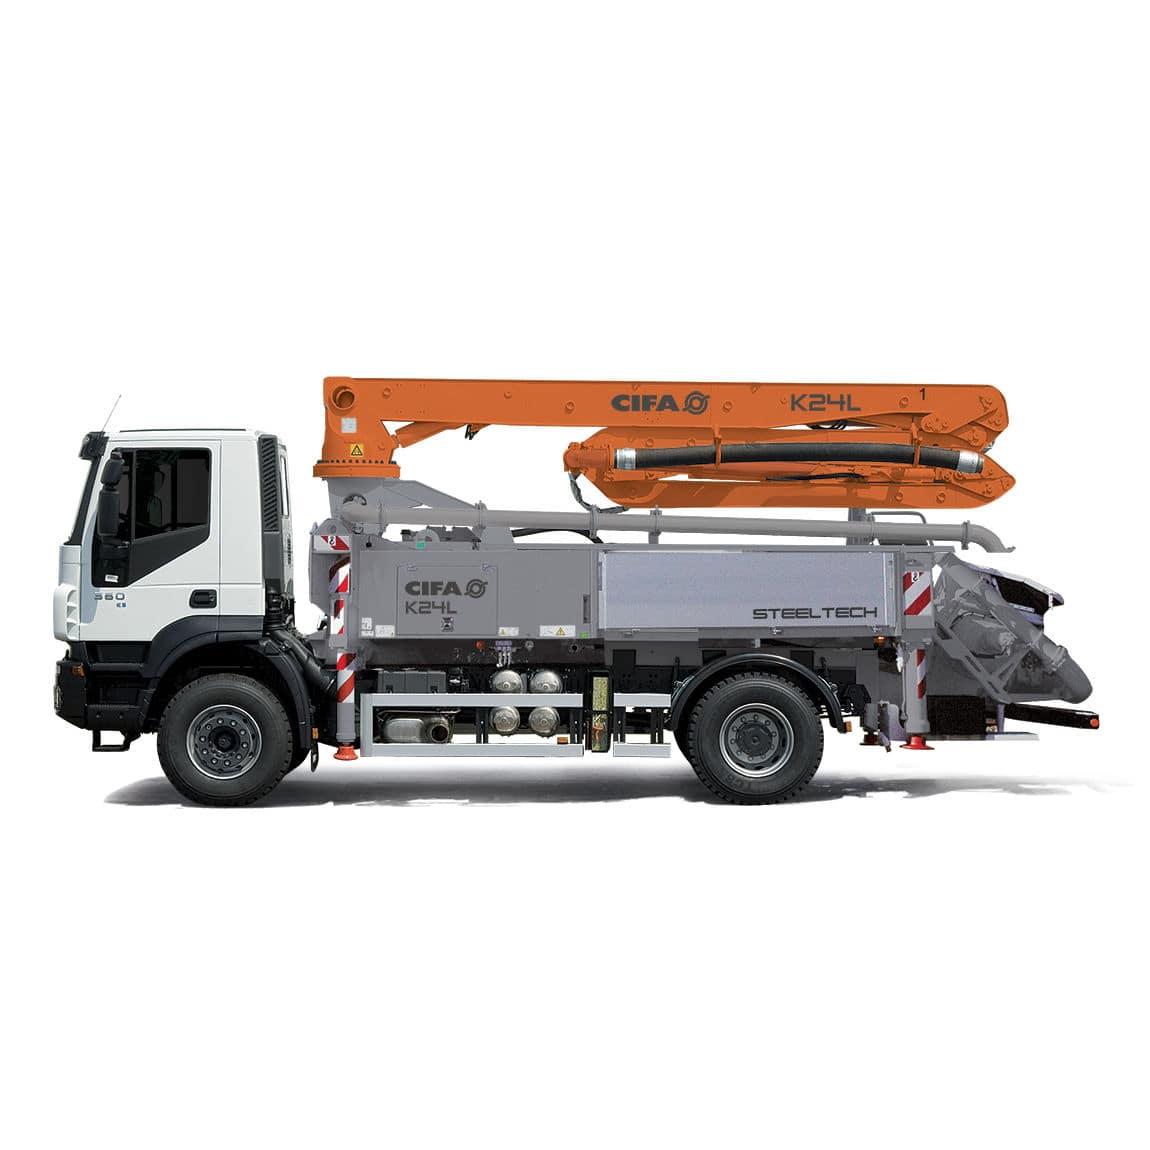 Mobile concrete pump / truck-mounted - K24L - CIFA S p A